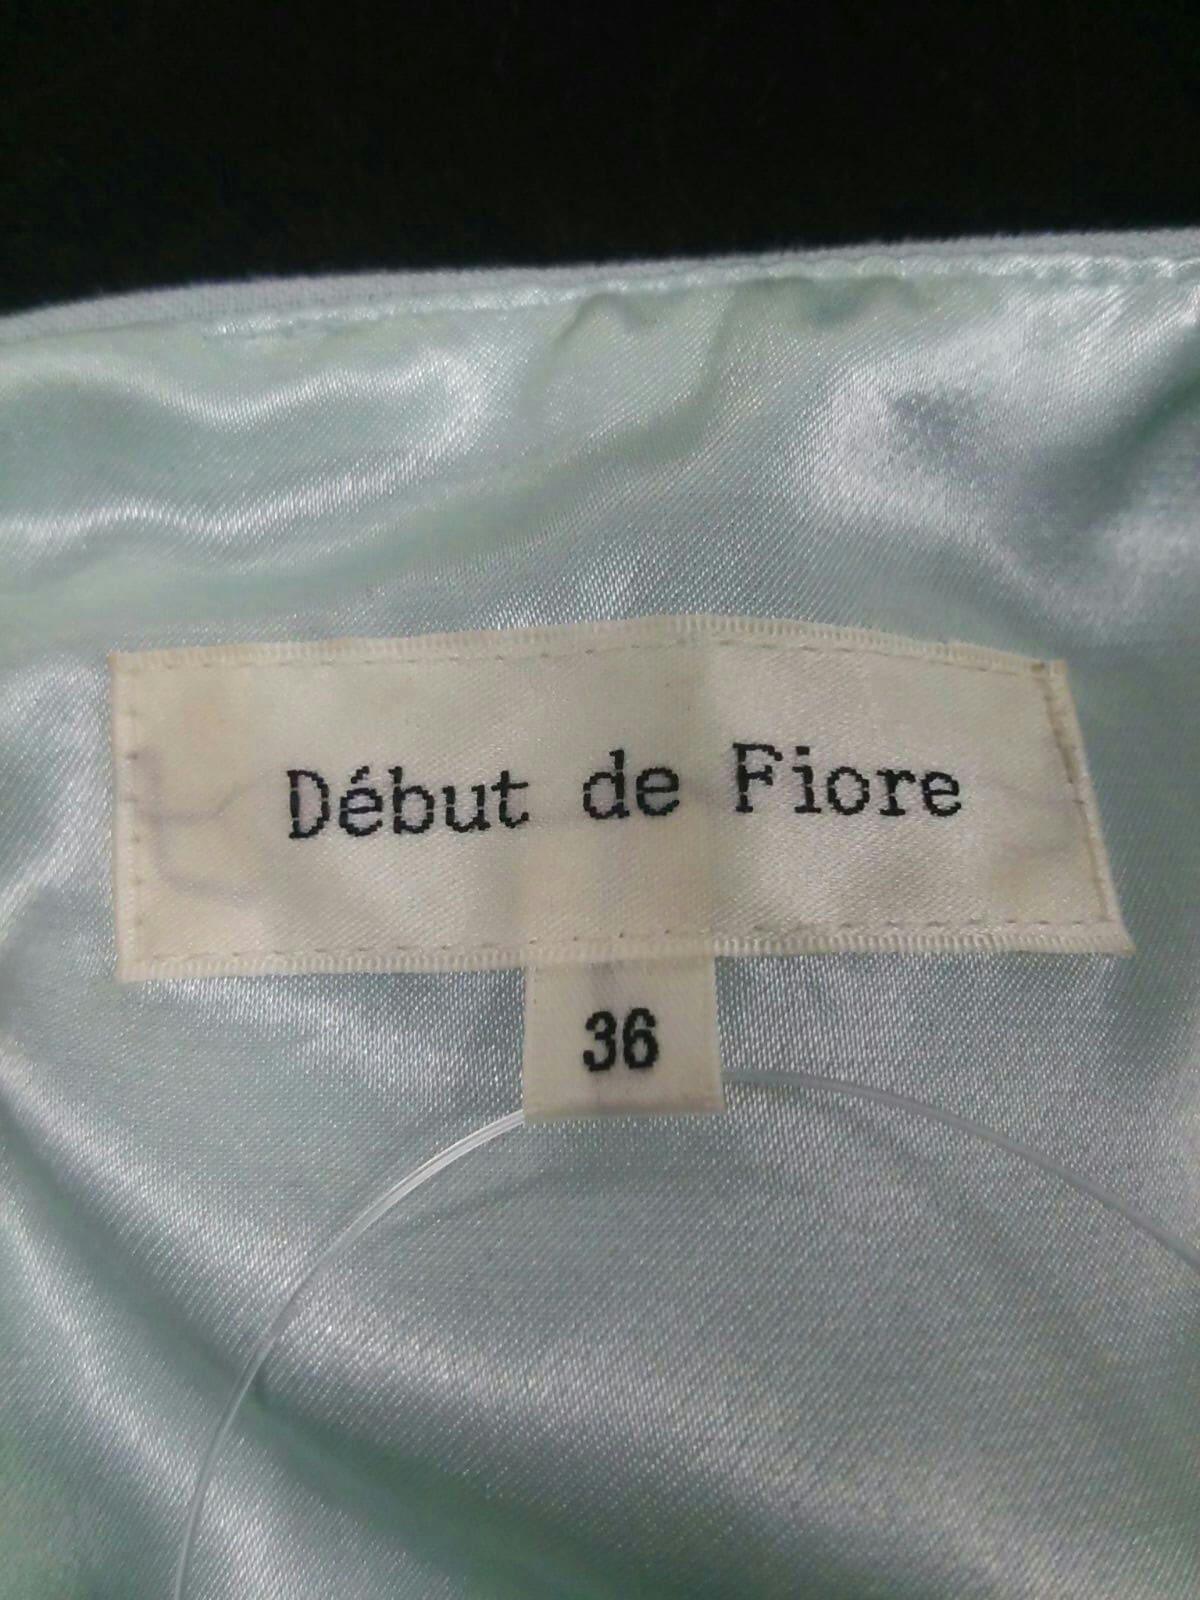 DebutdeFiore(デビュードフィオレ)のワンピース